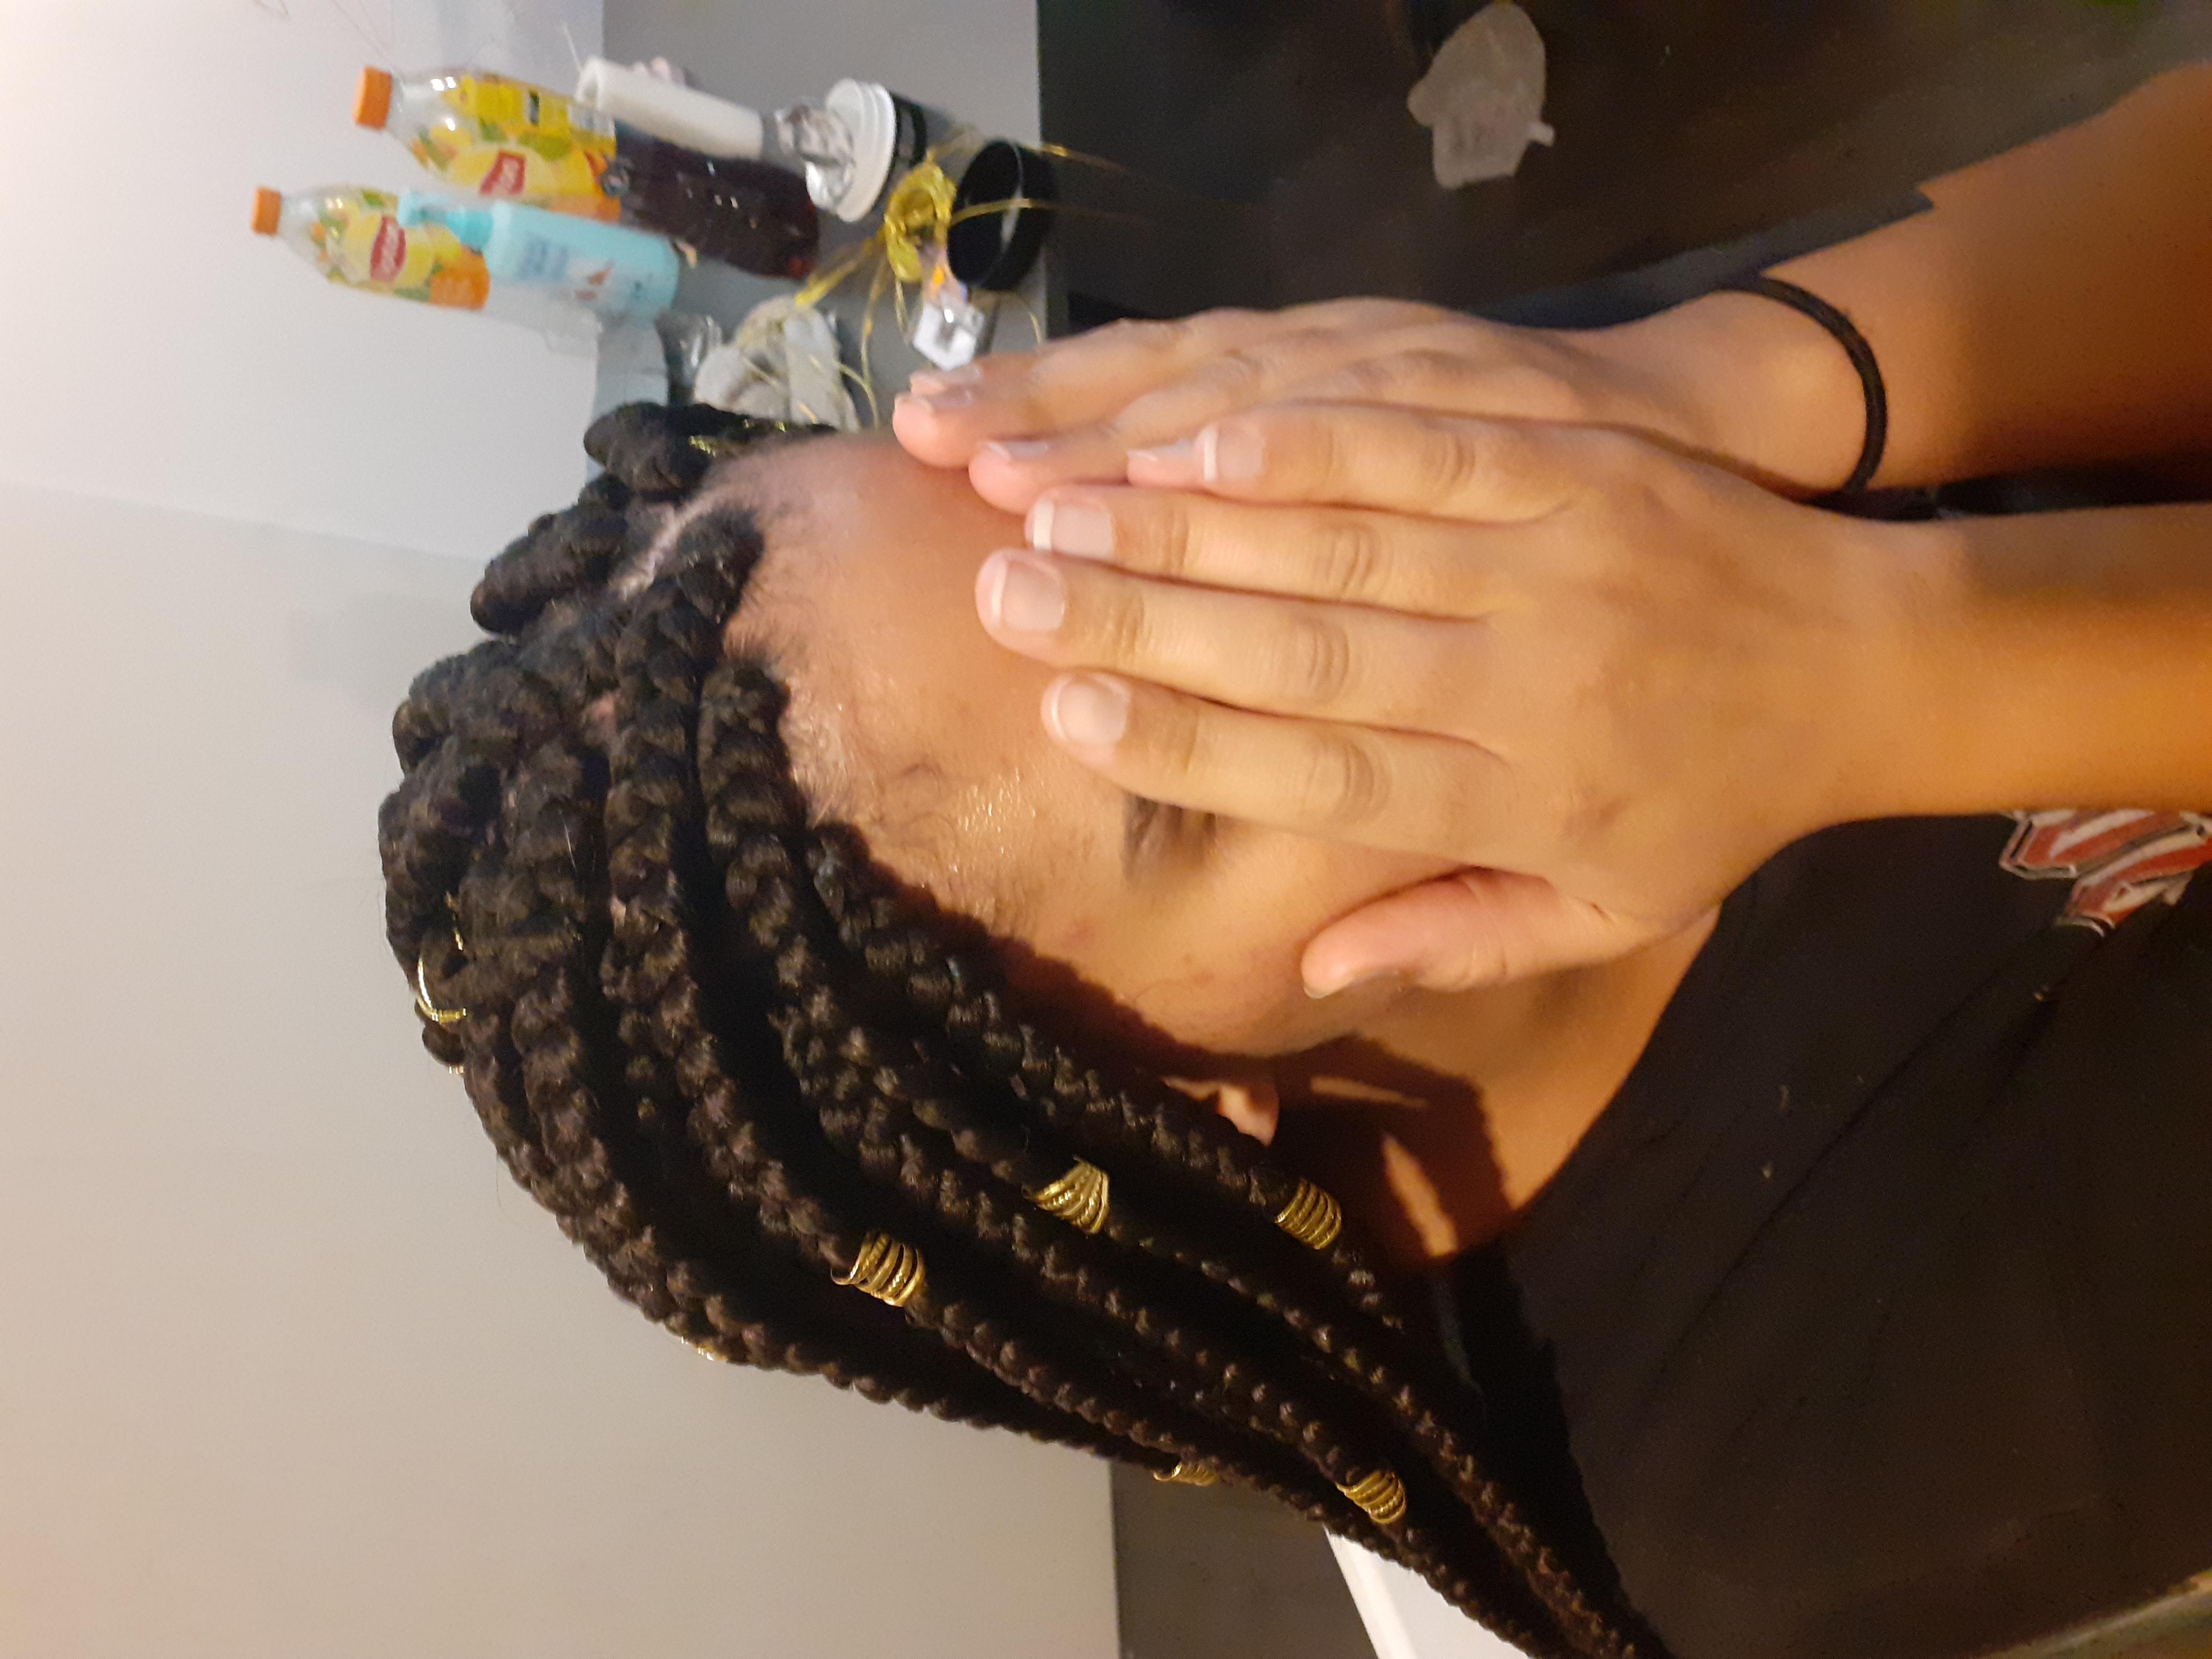 salon de coiffure afro tresse tresses box braids crochet braids vanilles tissages paris 75 77 78 91 92 93 94 95 NZQSIRIY